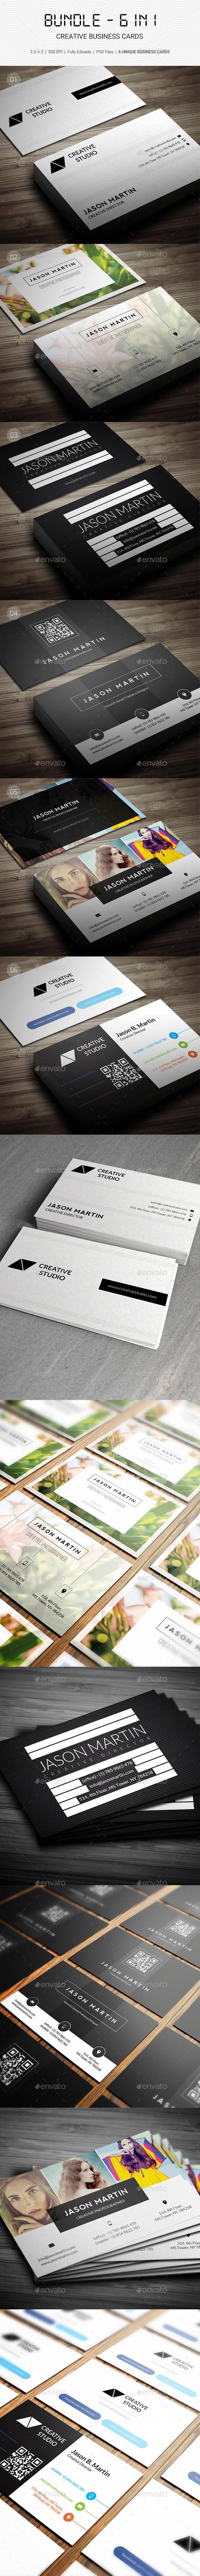 Bundle - Creative Business Cards - B26 - Creative Business Cards